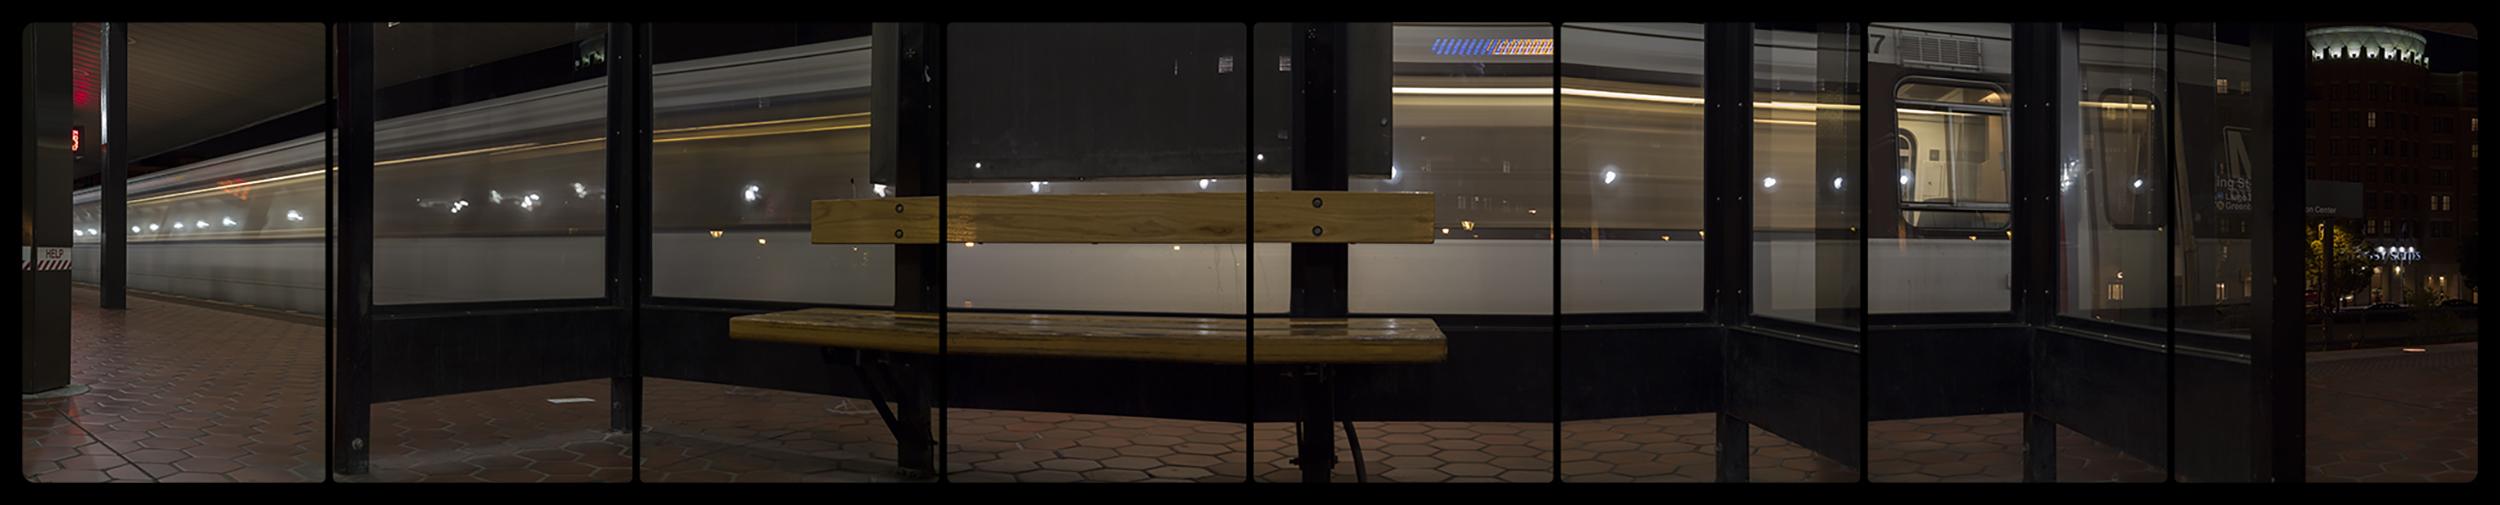 Metro Rail, King-Street Old-Town,6-27-2014,3761-3770